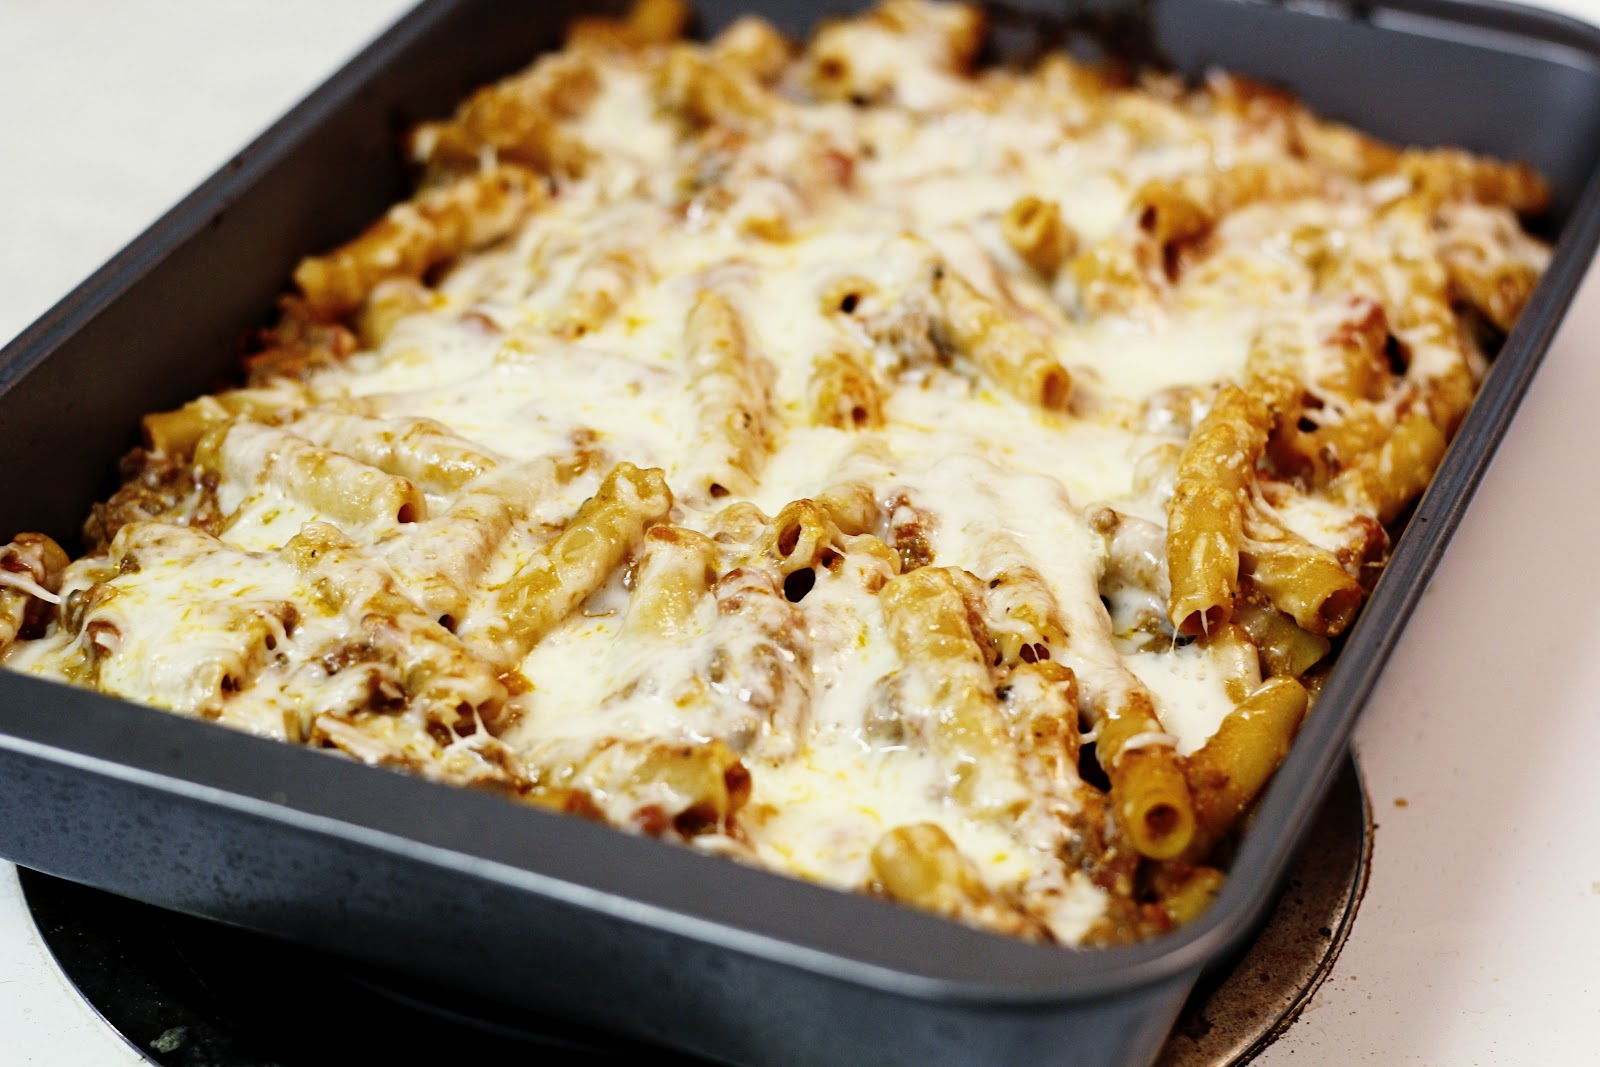 Virginia and Charlie: Day 12 - Lasagna Style Baked Ziti